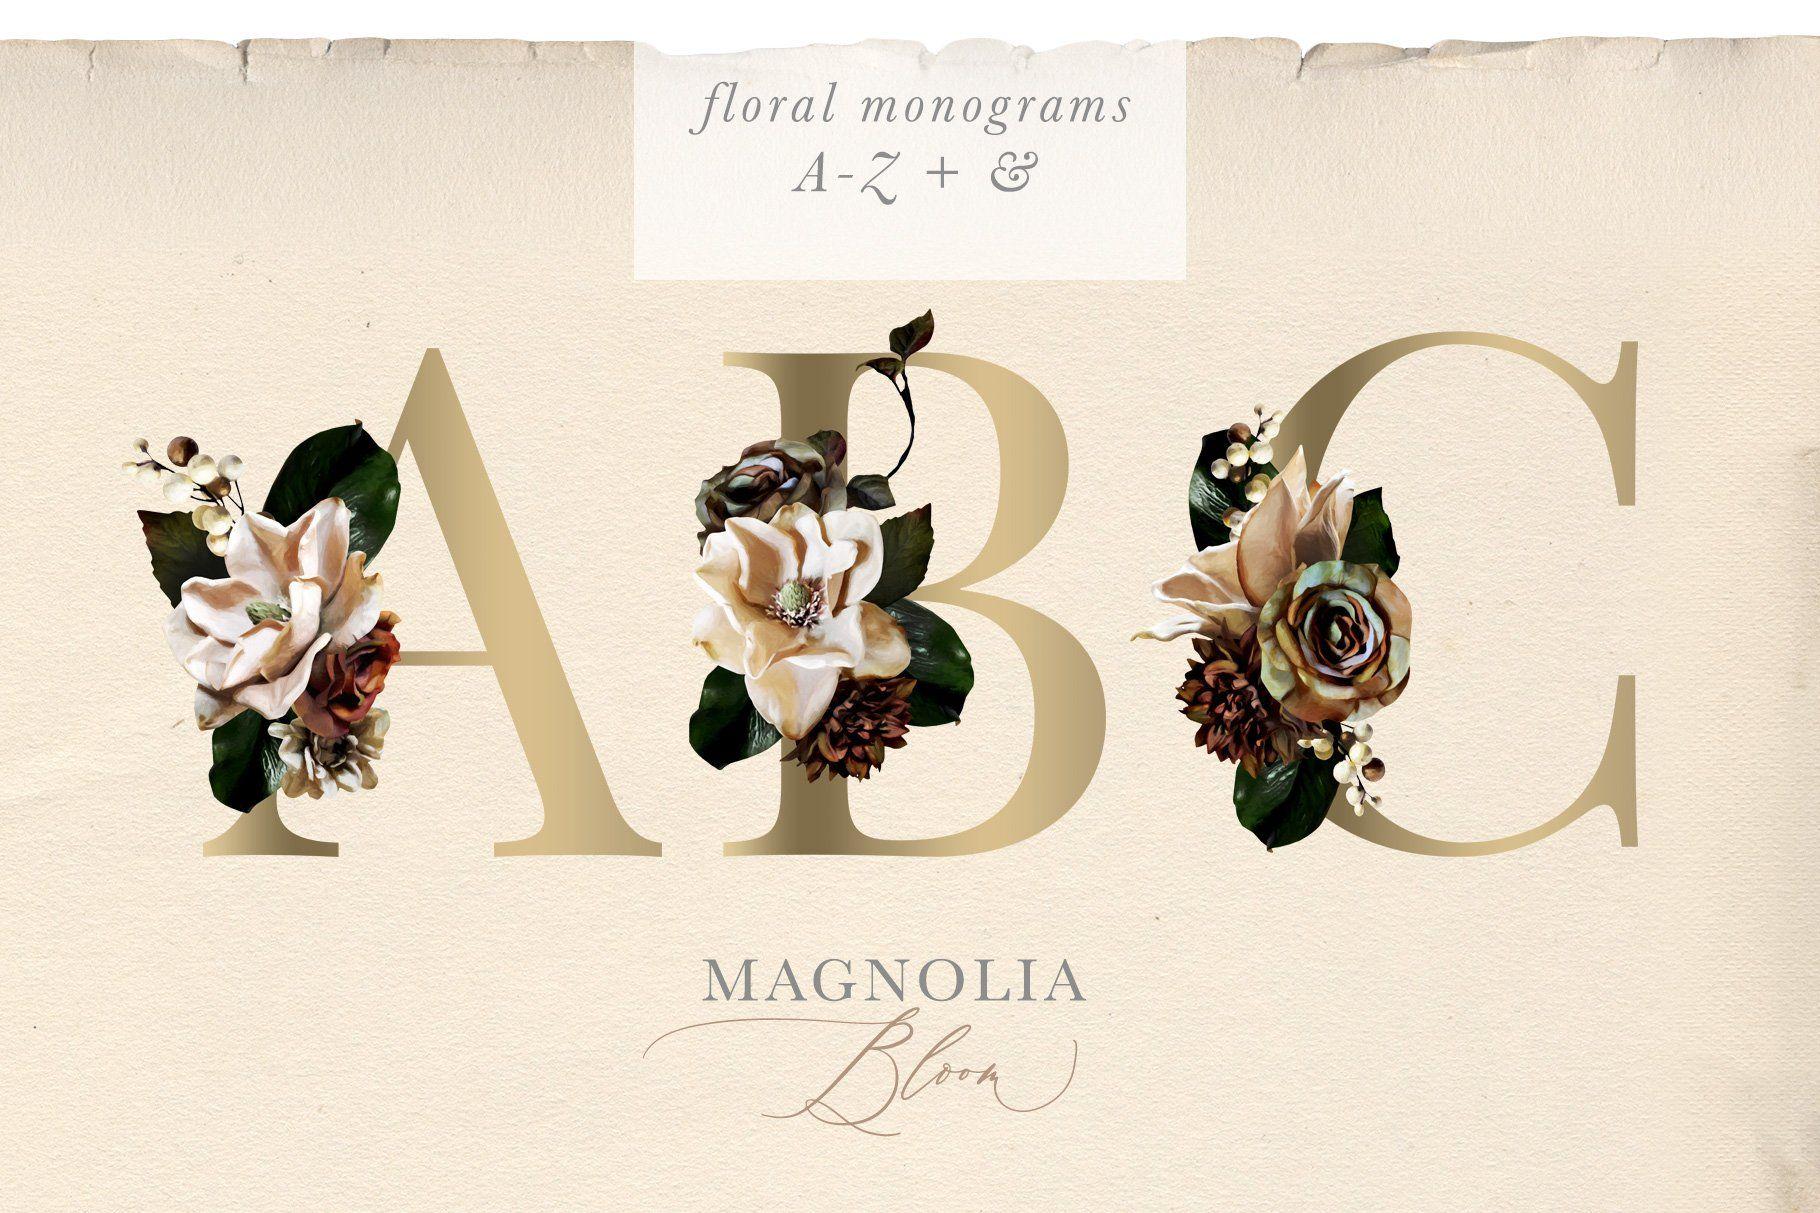 Magnolia Bloom Flowers Monograms Creative Graphic Design Graphic Design Photoshop Graphic Design Studios